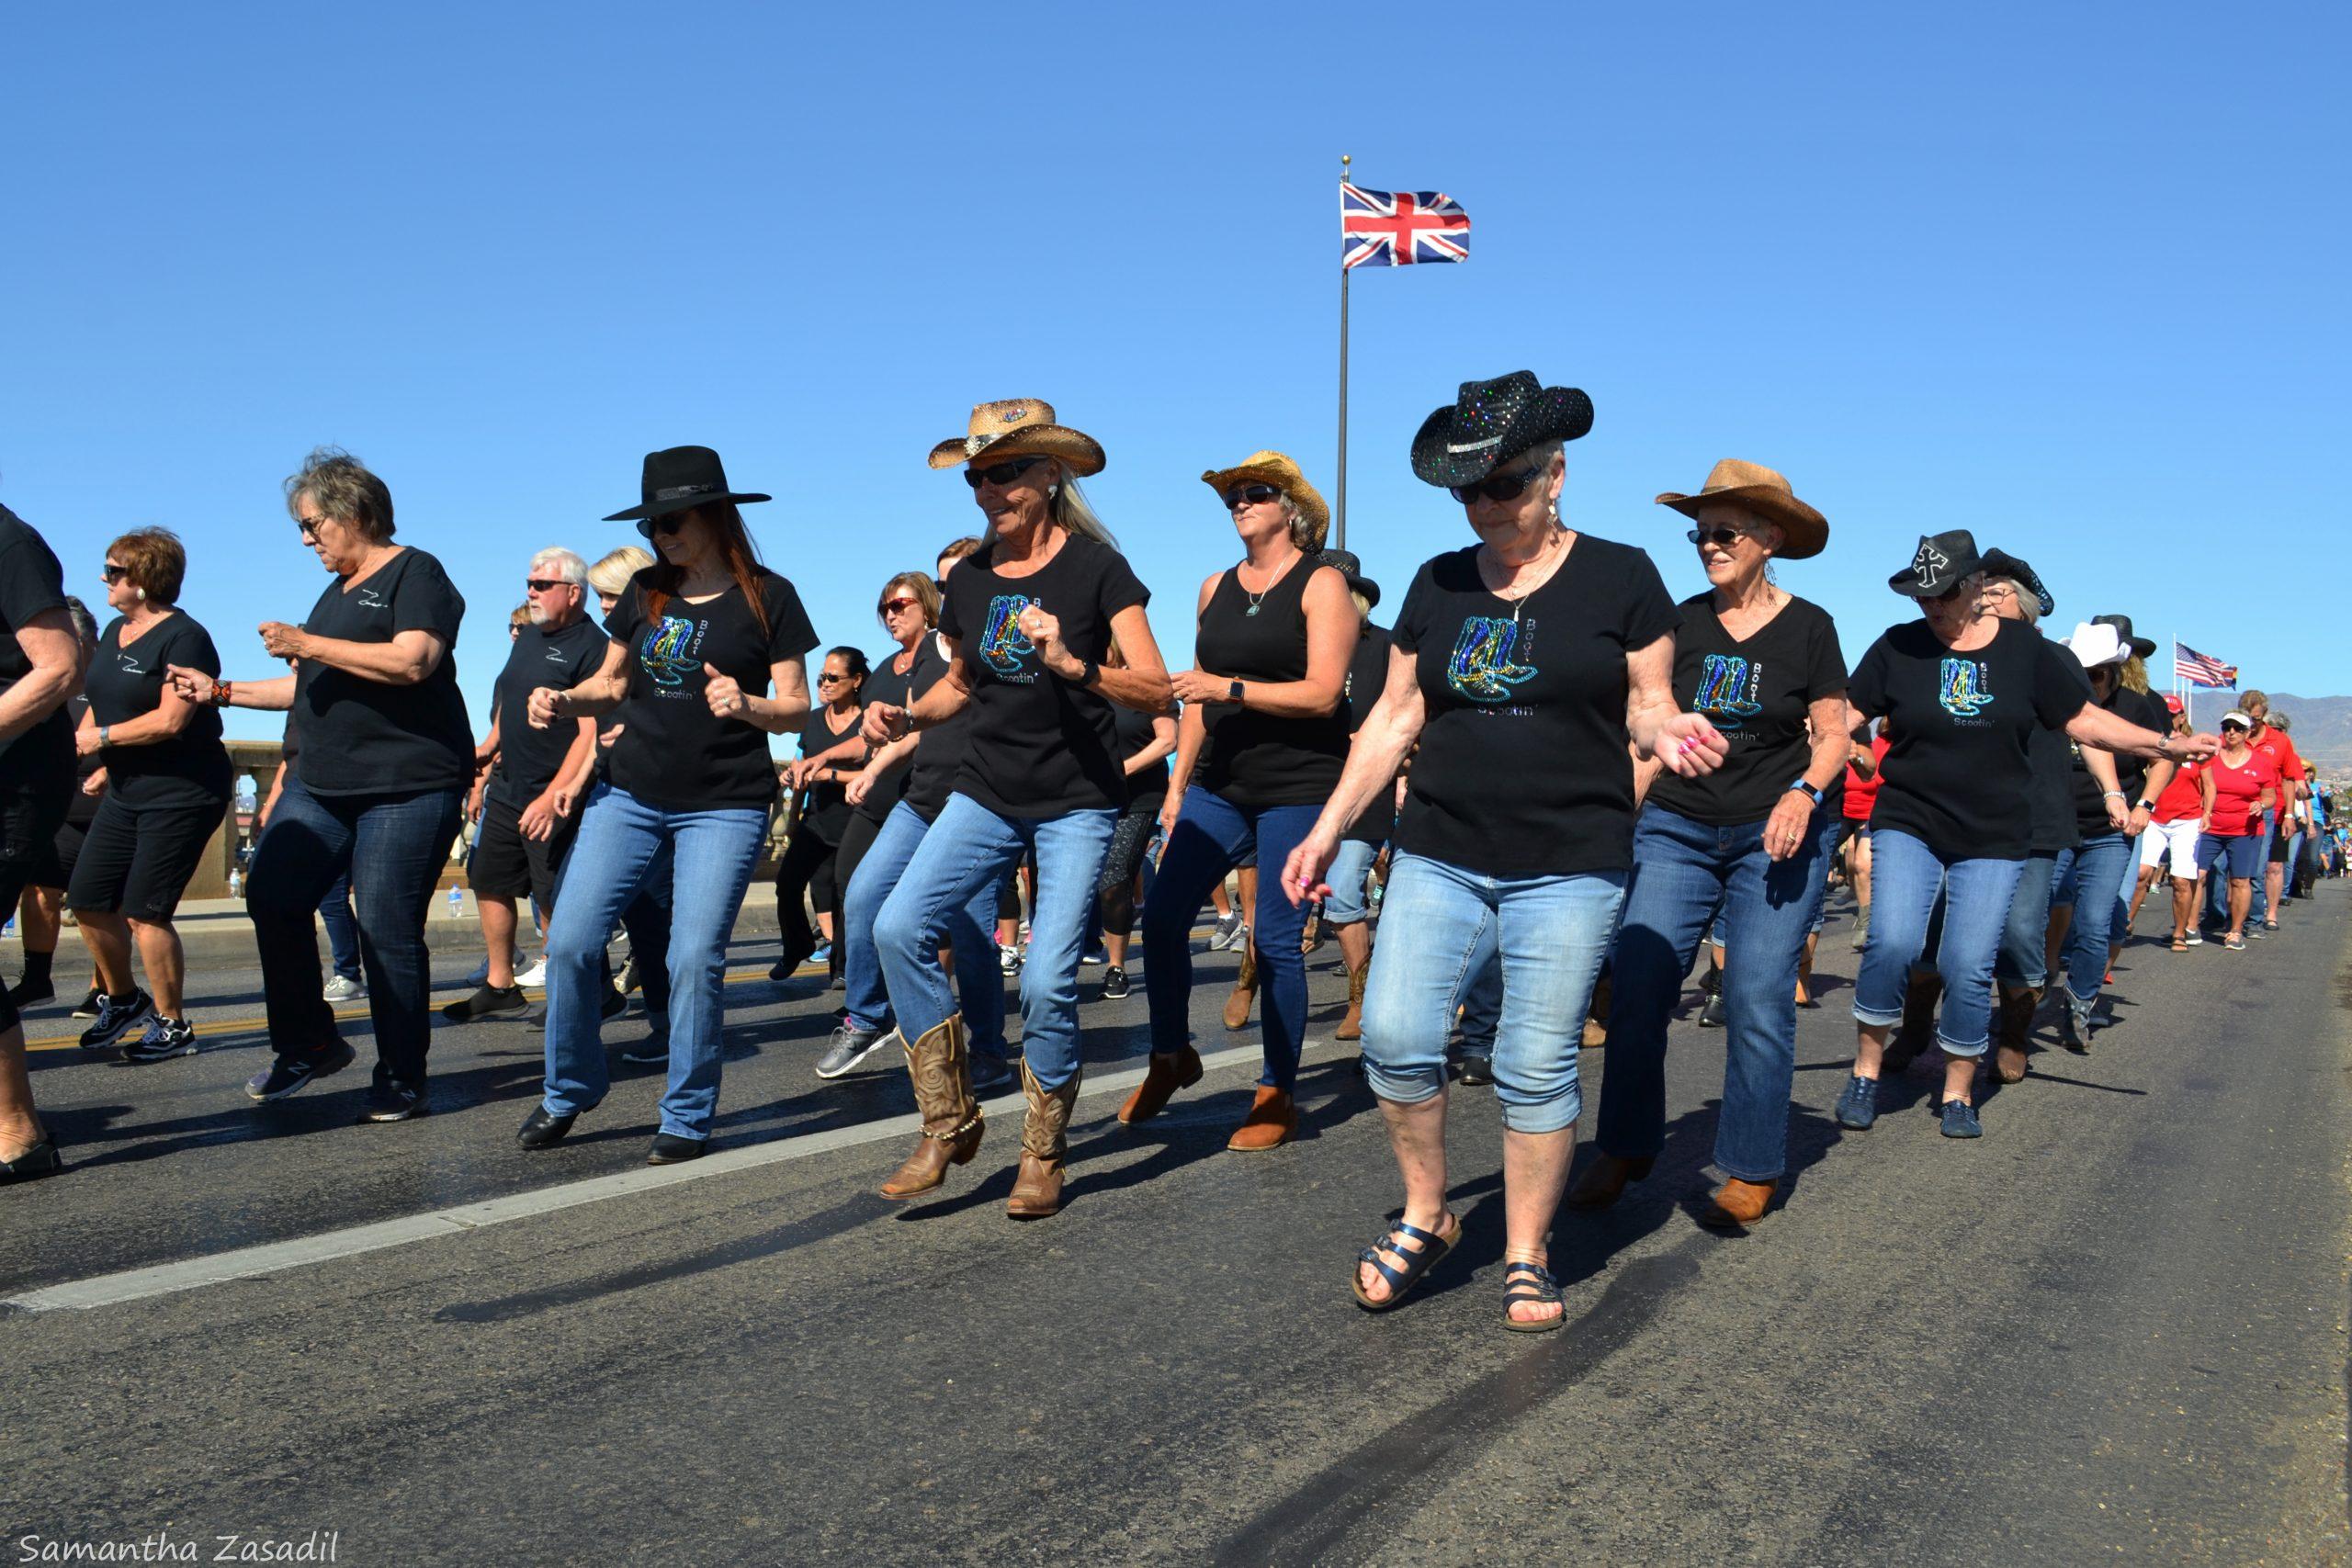 Line Dancers Comandeer London Bridge Sunday For 9th Annual Event